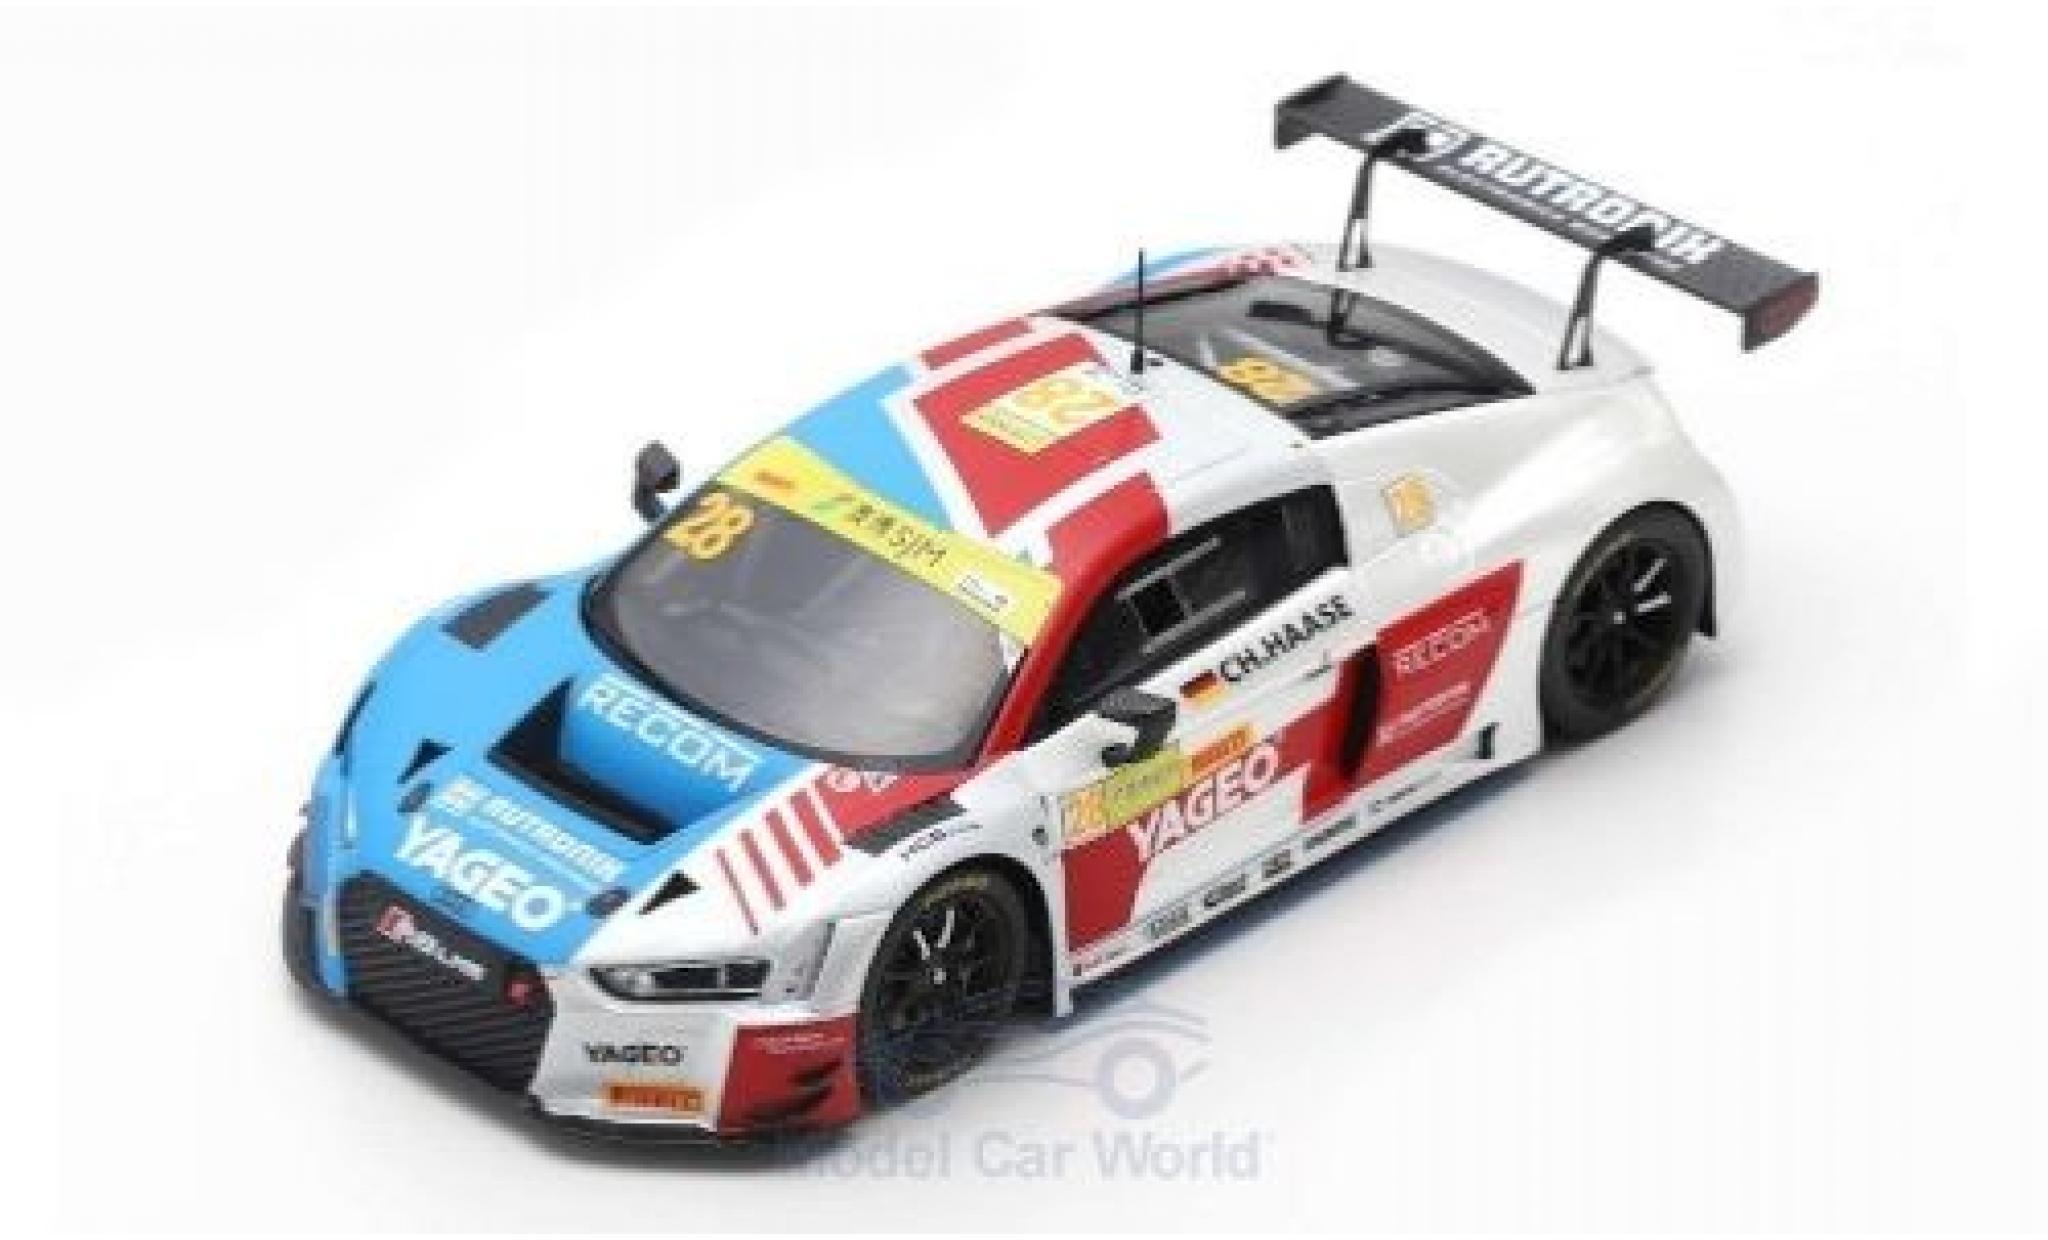 Audi R8 1/43 Spark LMS No.28 Sport Team Rutronik Fia GT World Cup Macau 2018 C.Haase